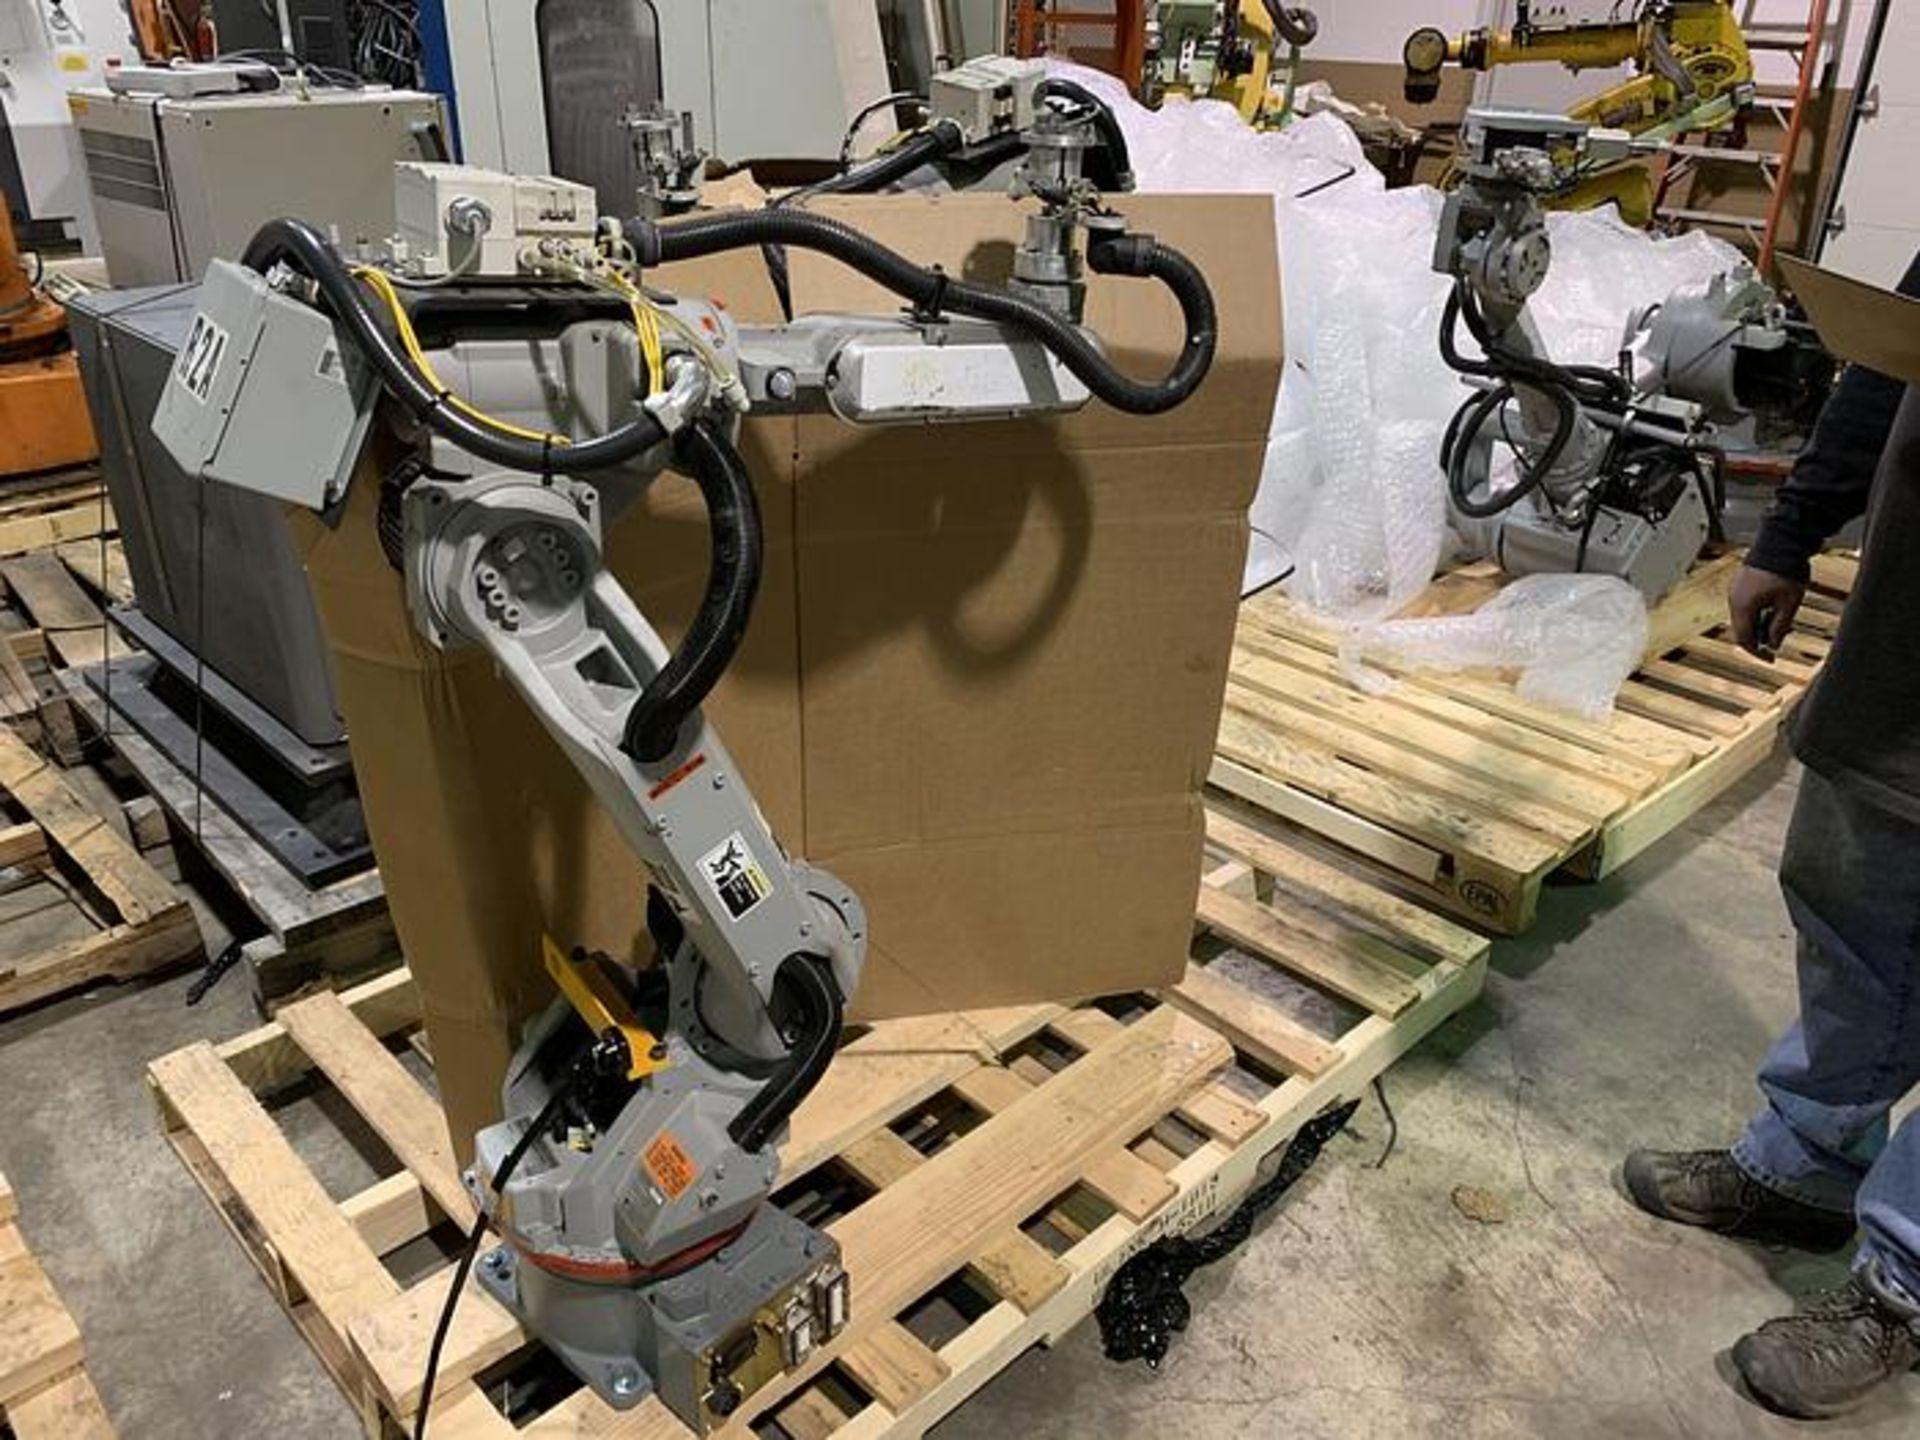 Lot 58 - MOTOMAN SSF2000 6 KG X 1,378mm REACH 6 AXIS CNC ROBOT WITH NX100 CONTROL, YEAR 2008, SN S86AO7-1-4